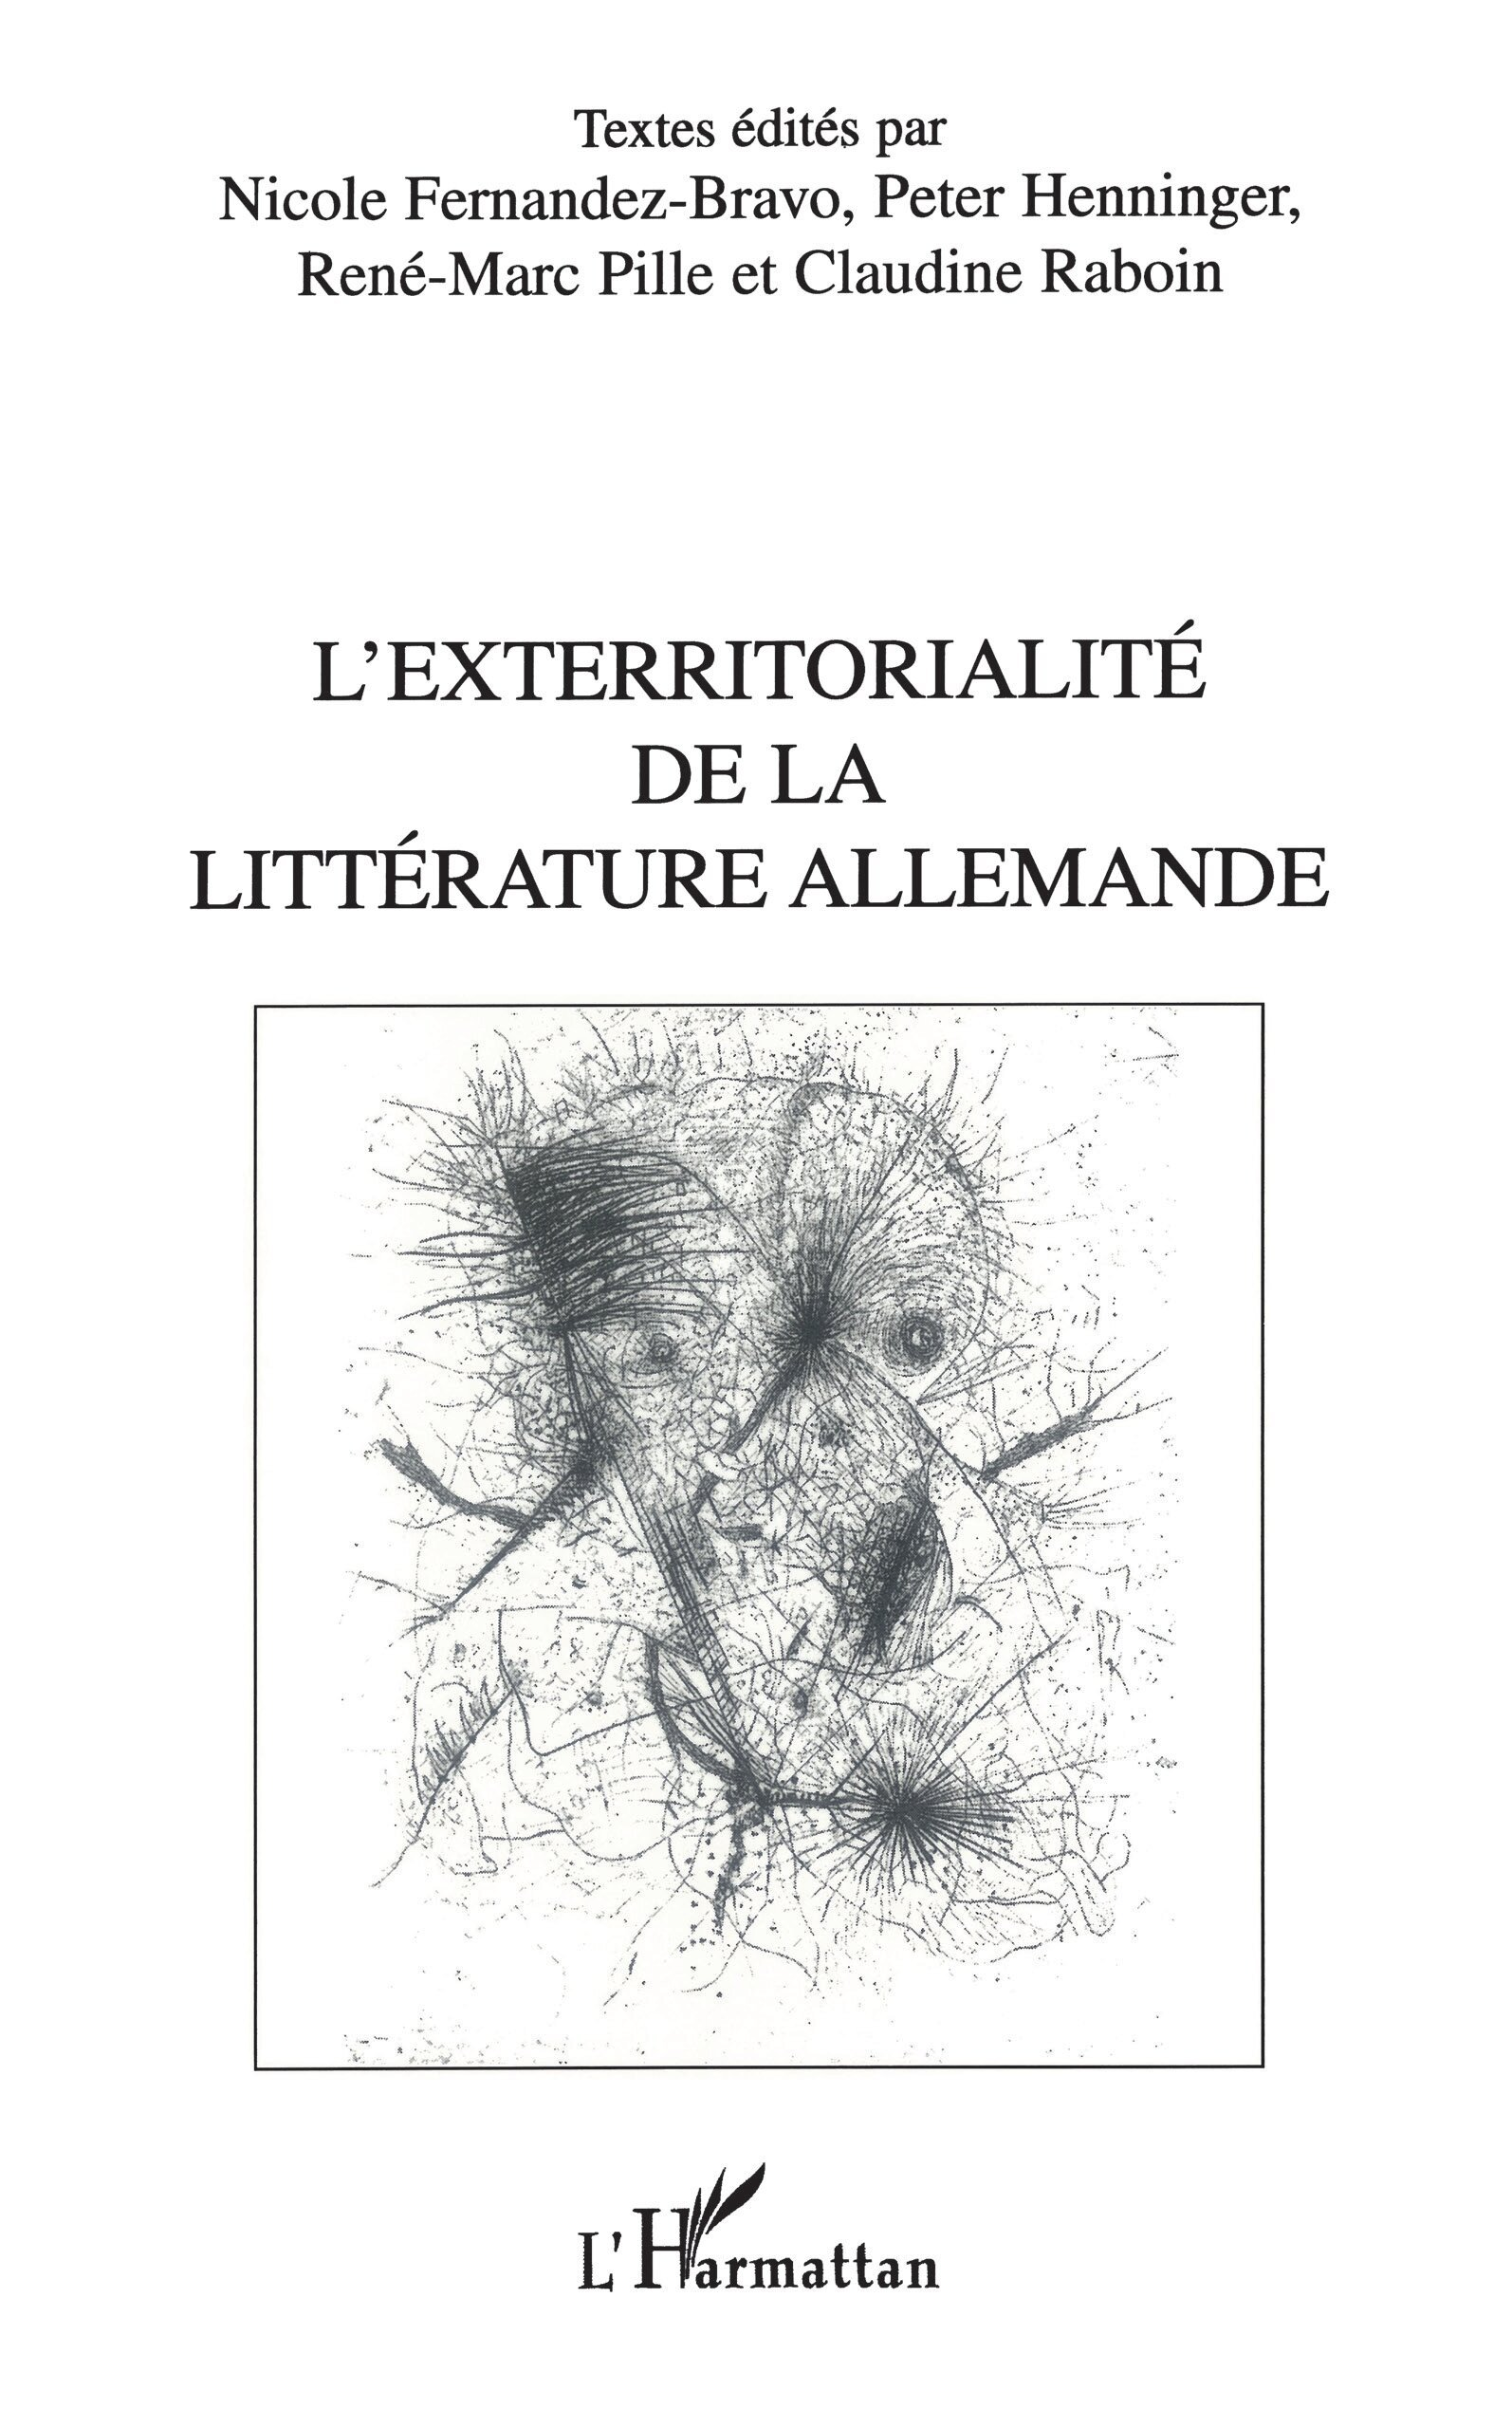 EXTERRITORIALITE DE LA  LITTERATURE ALLEMANDE